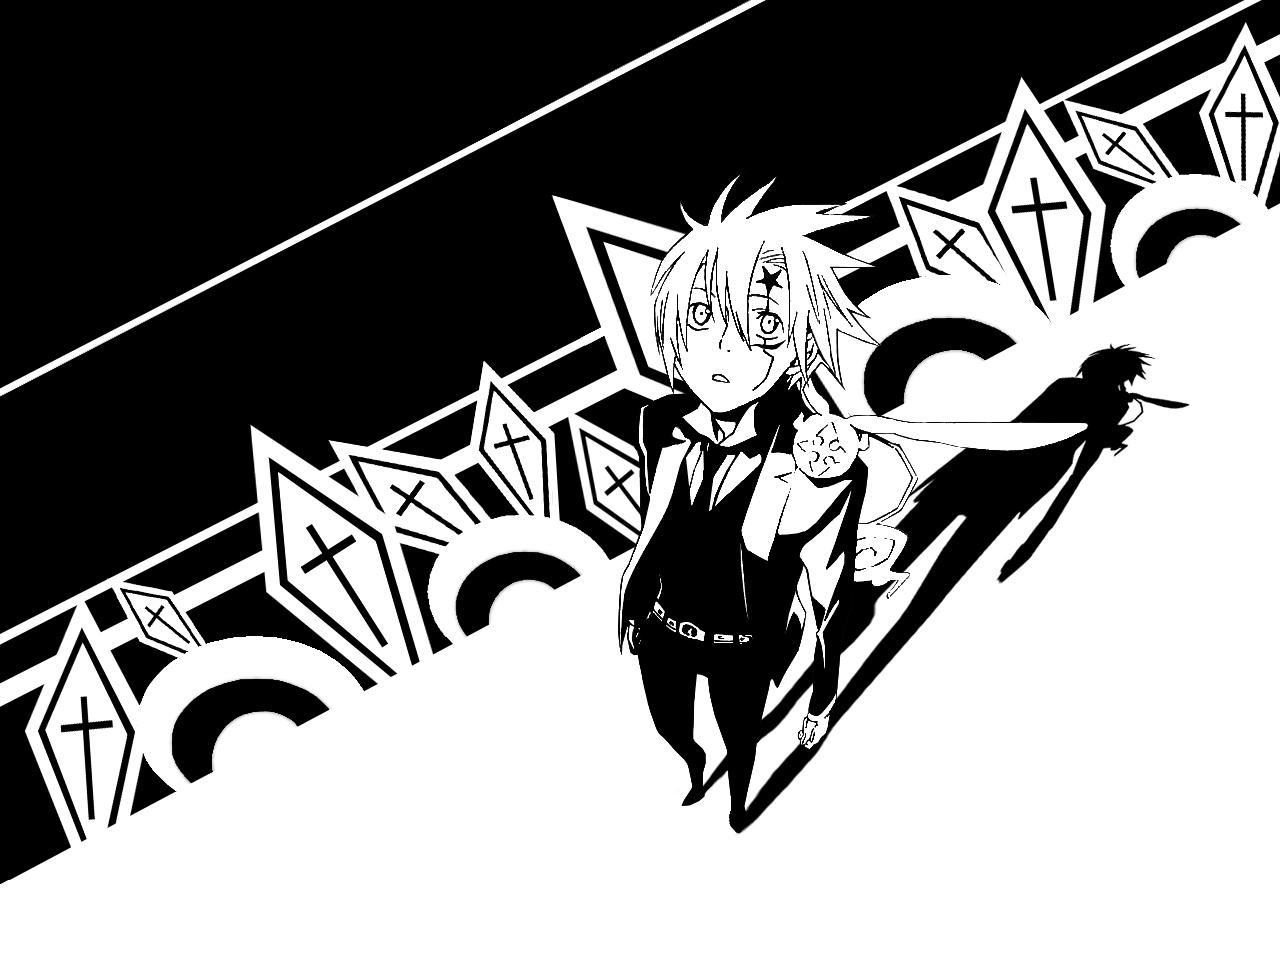 D Gray Man 壁紙04 キヲクの欠片